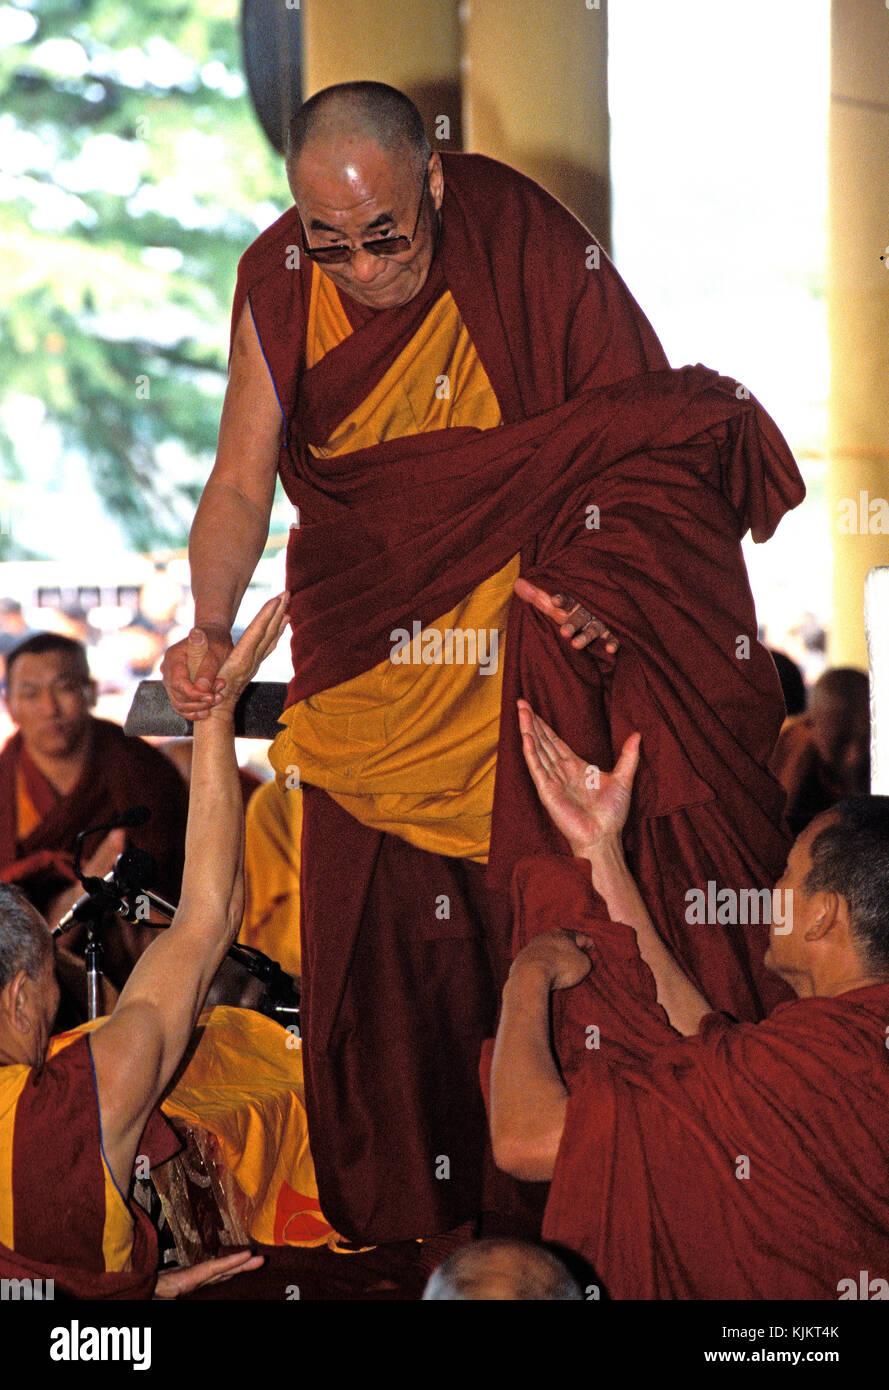 The Dalai Lama in Mac Leod Ganj. India. - Stock Image